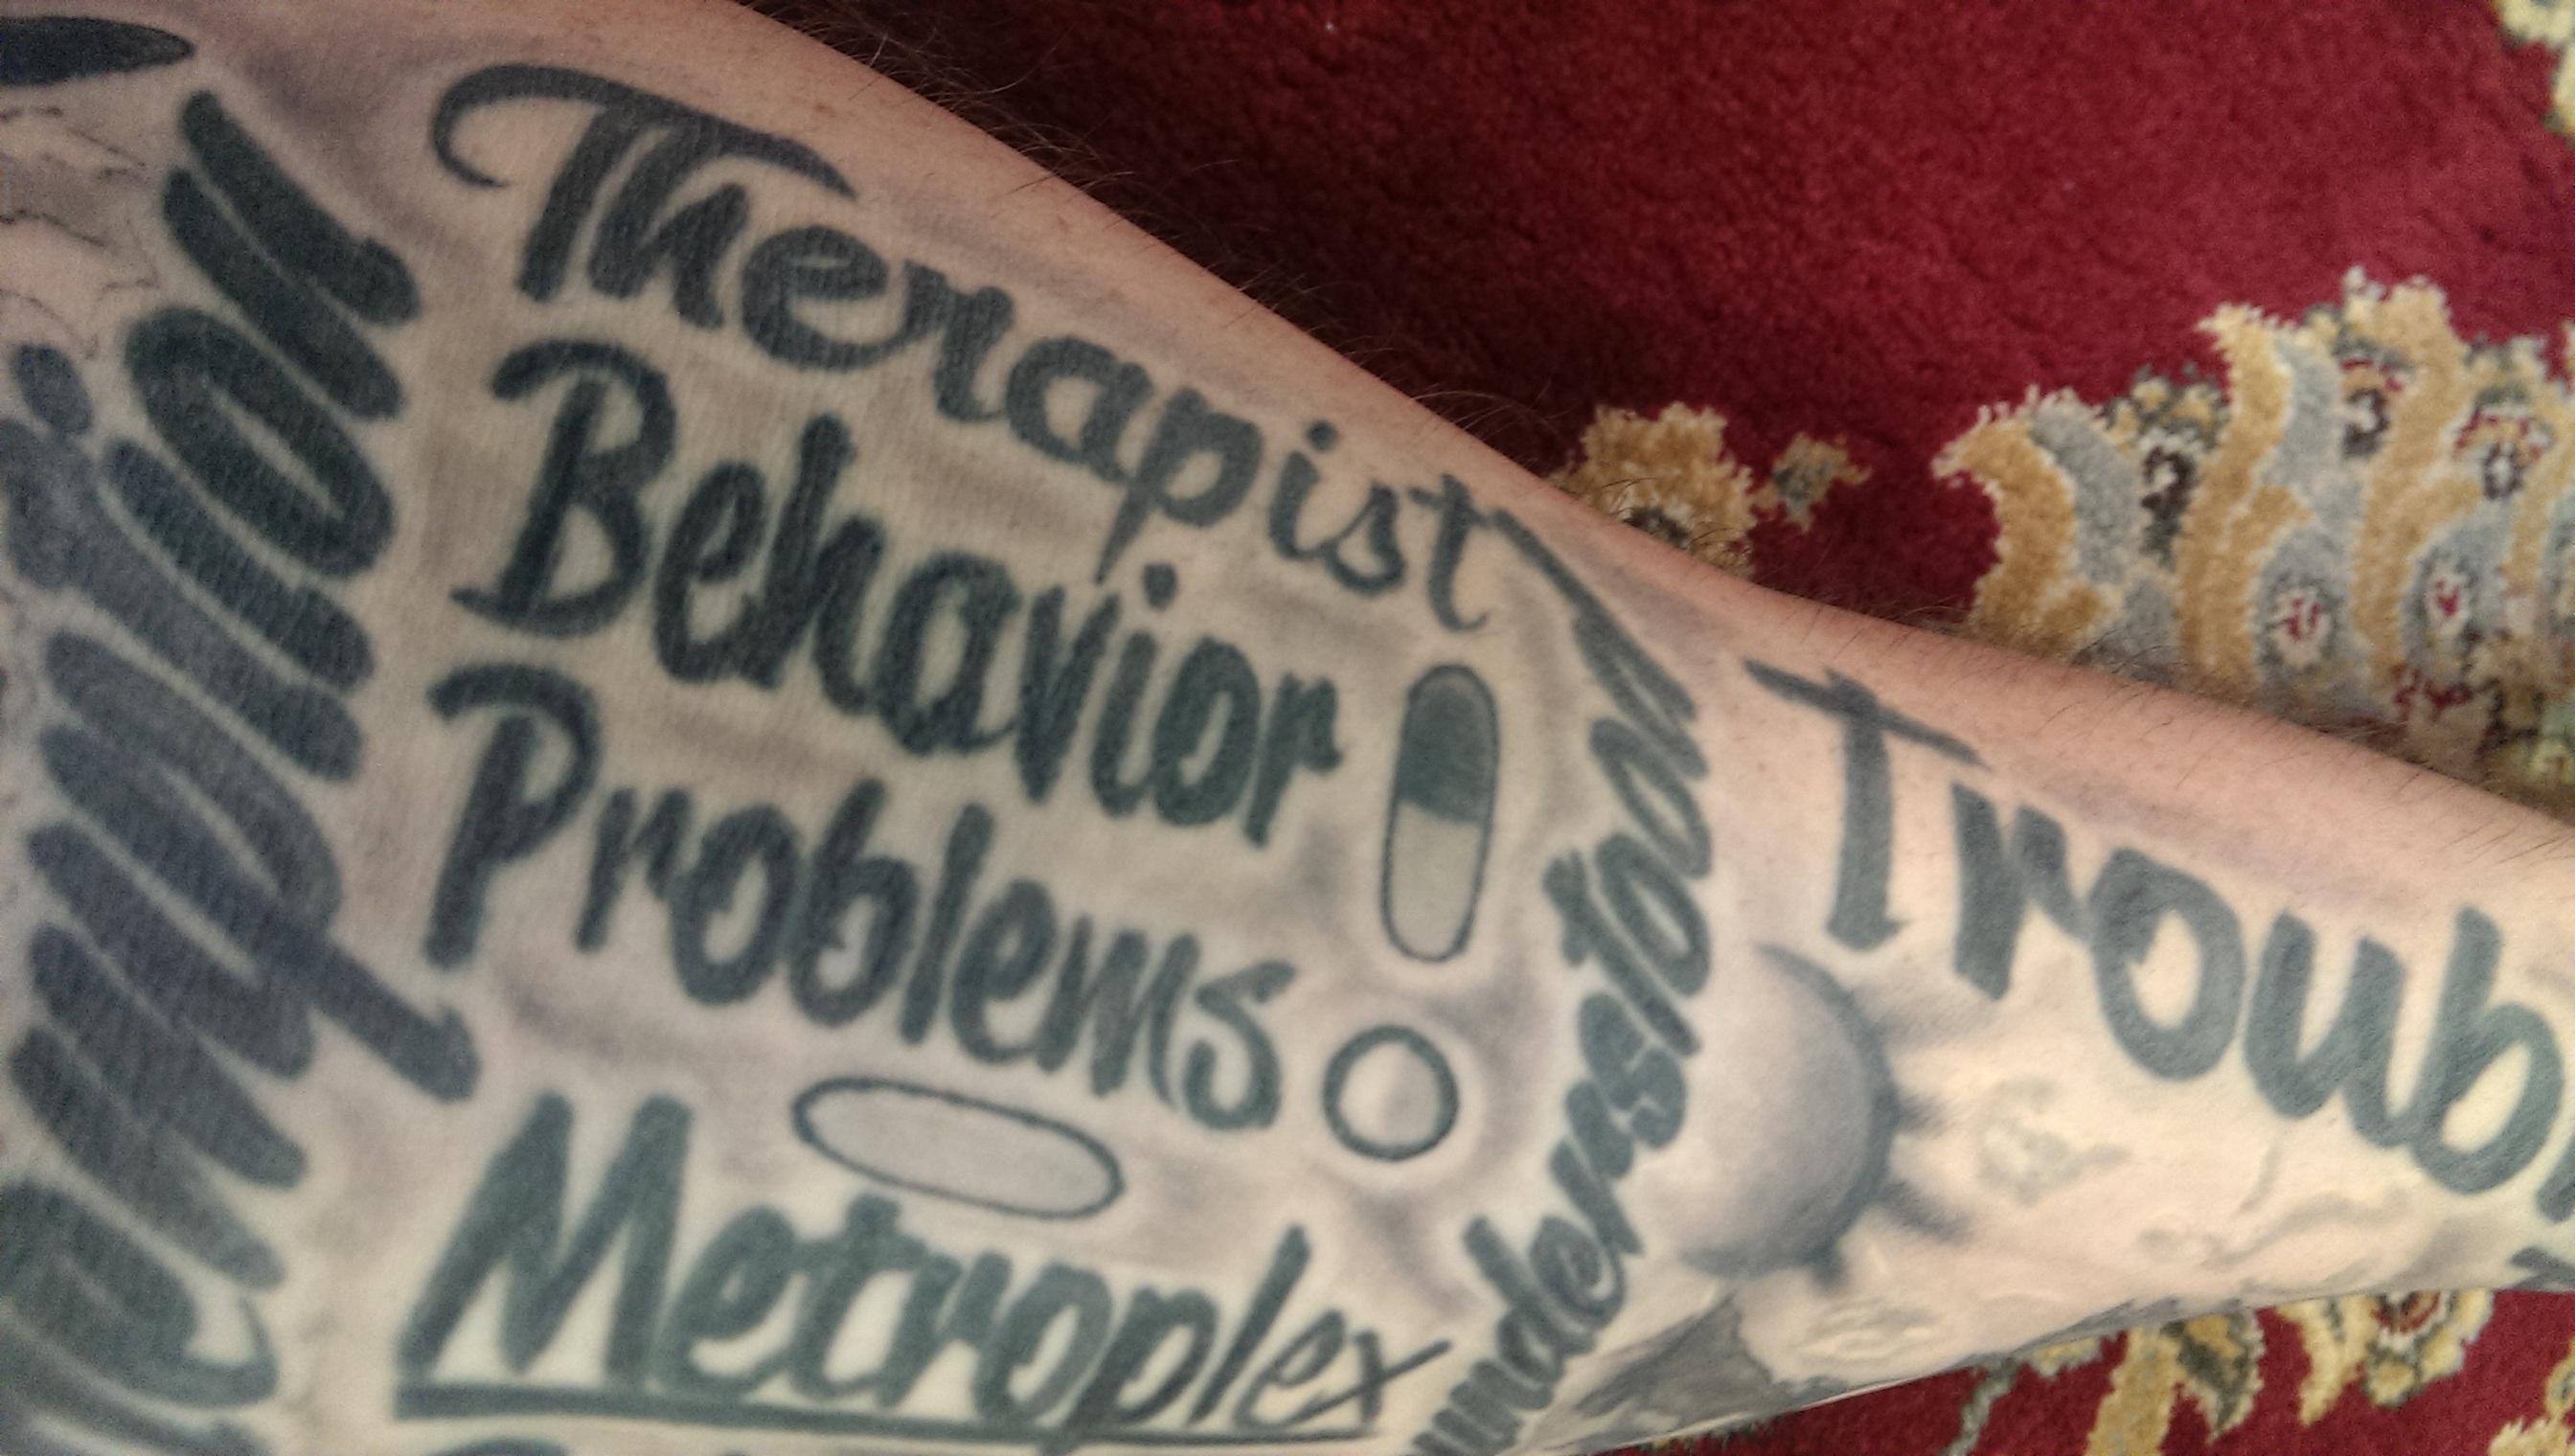 therapist, behavior problems, pills tattoo